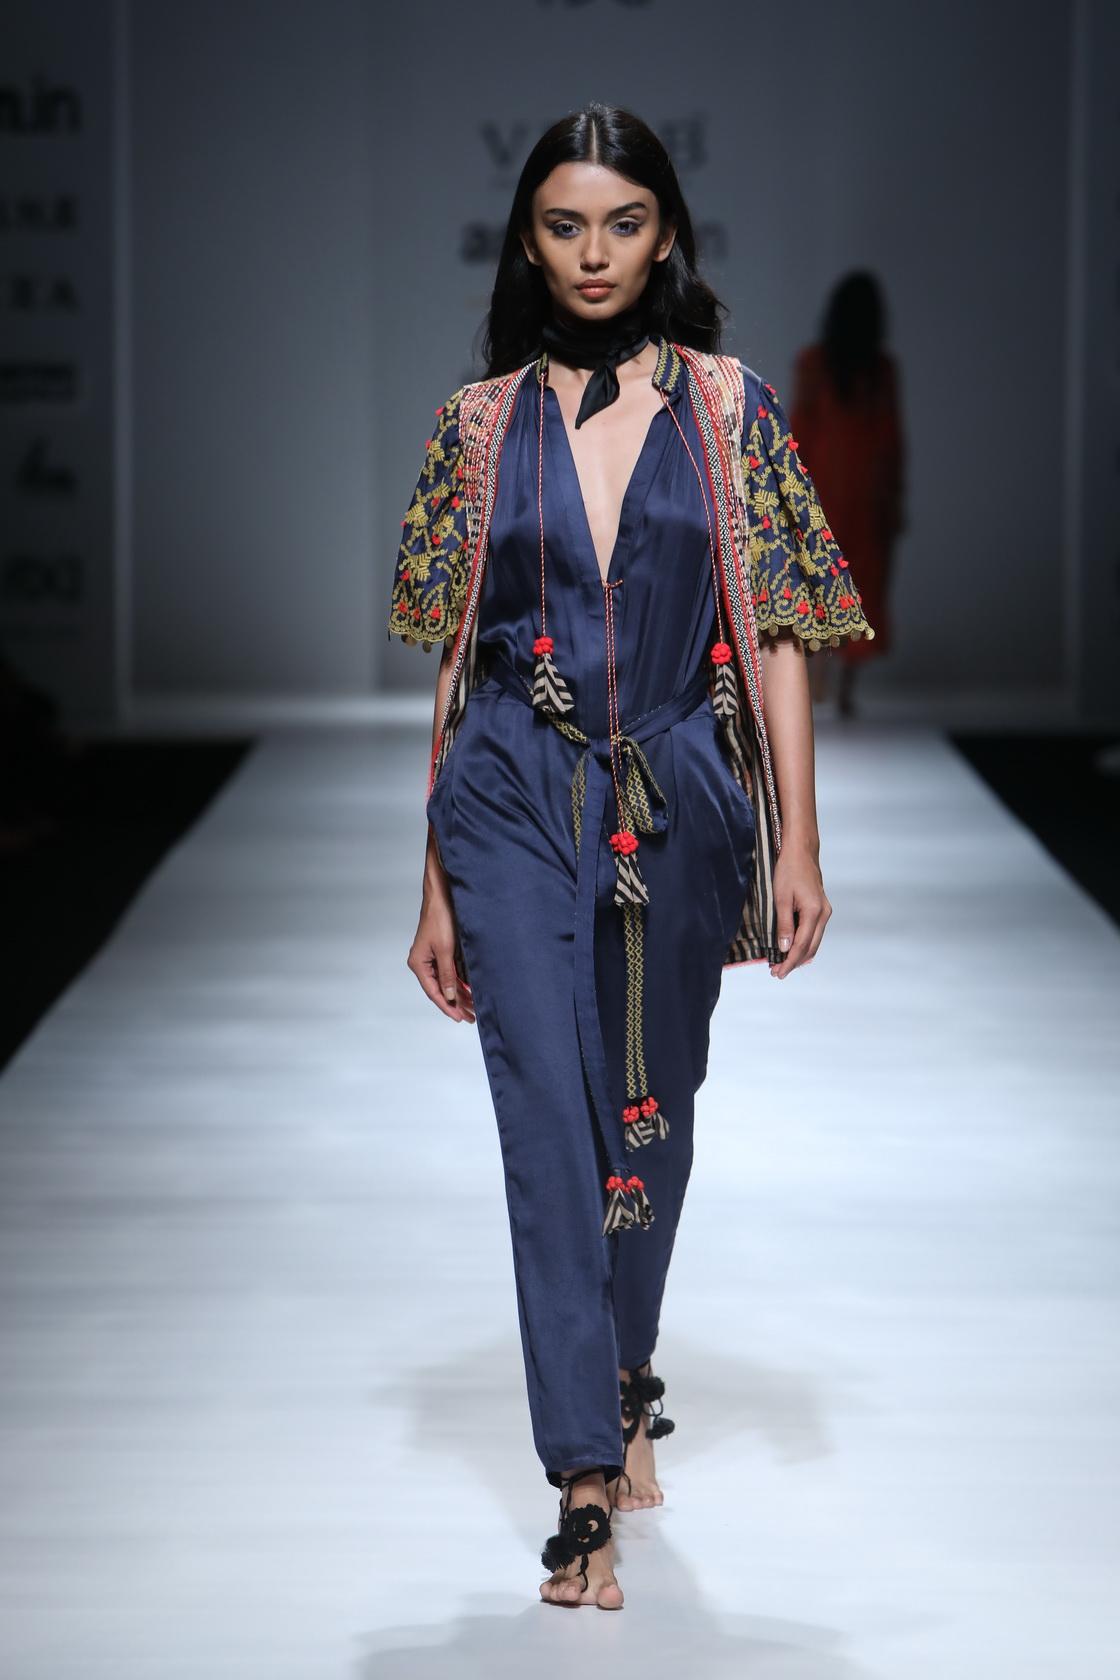 Verb by Pallavi Singhee - Amazon India Fashion Week AW17